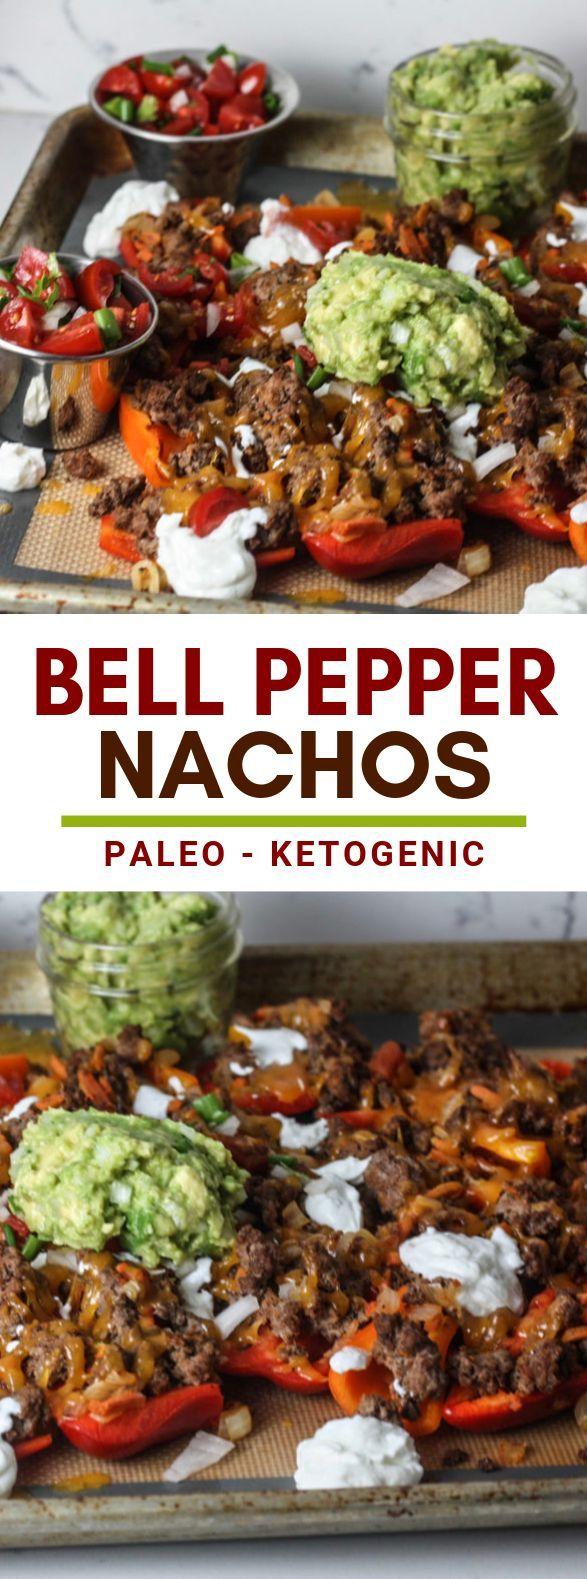 Bell Pepper Nachos #paleo #ketodiet #bellpeppers